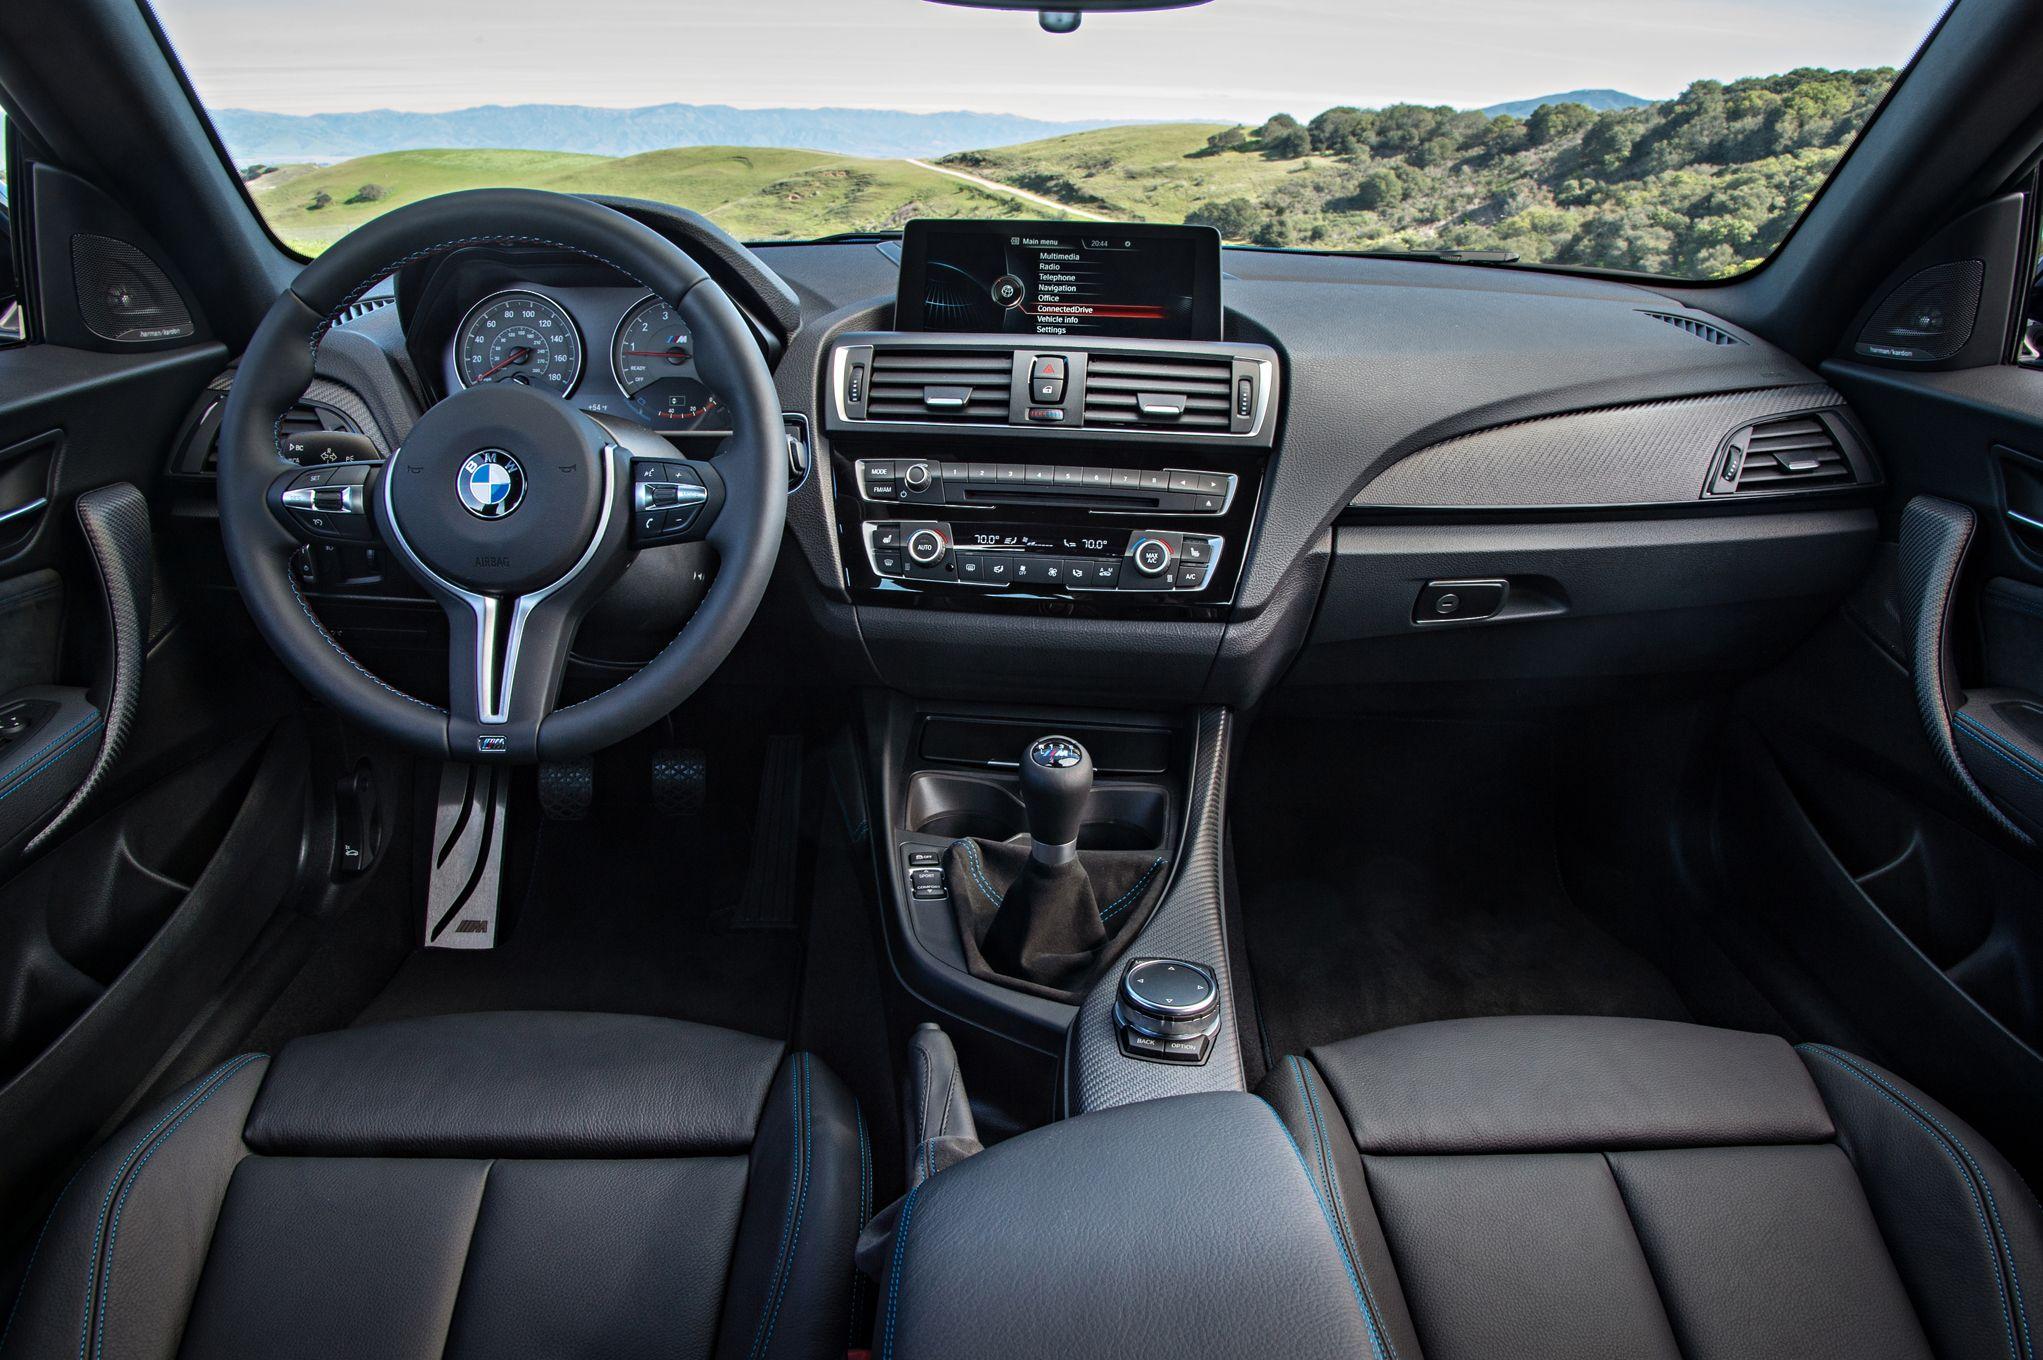 bmw-1-series-m-coupe-interior-02.jpg